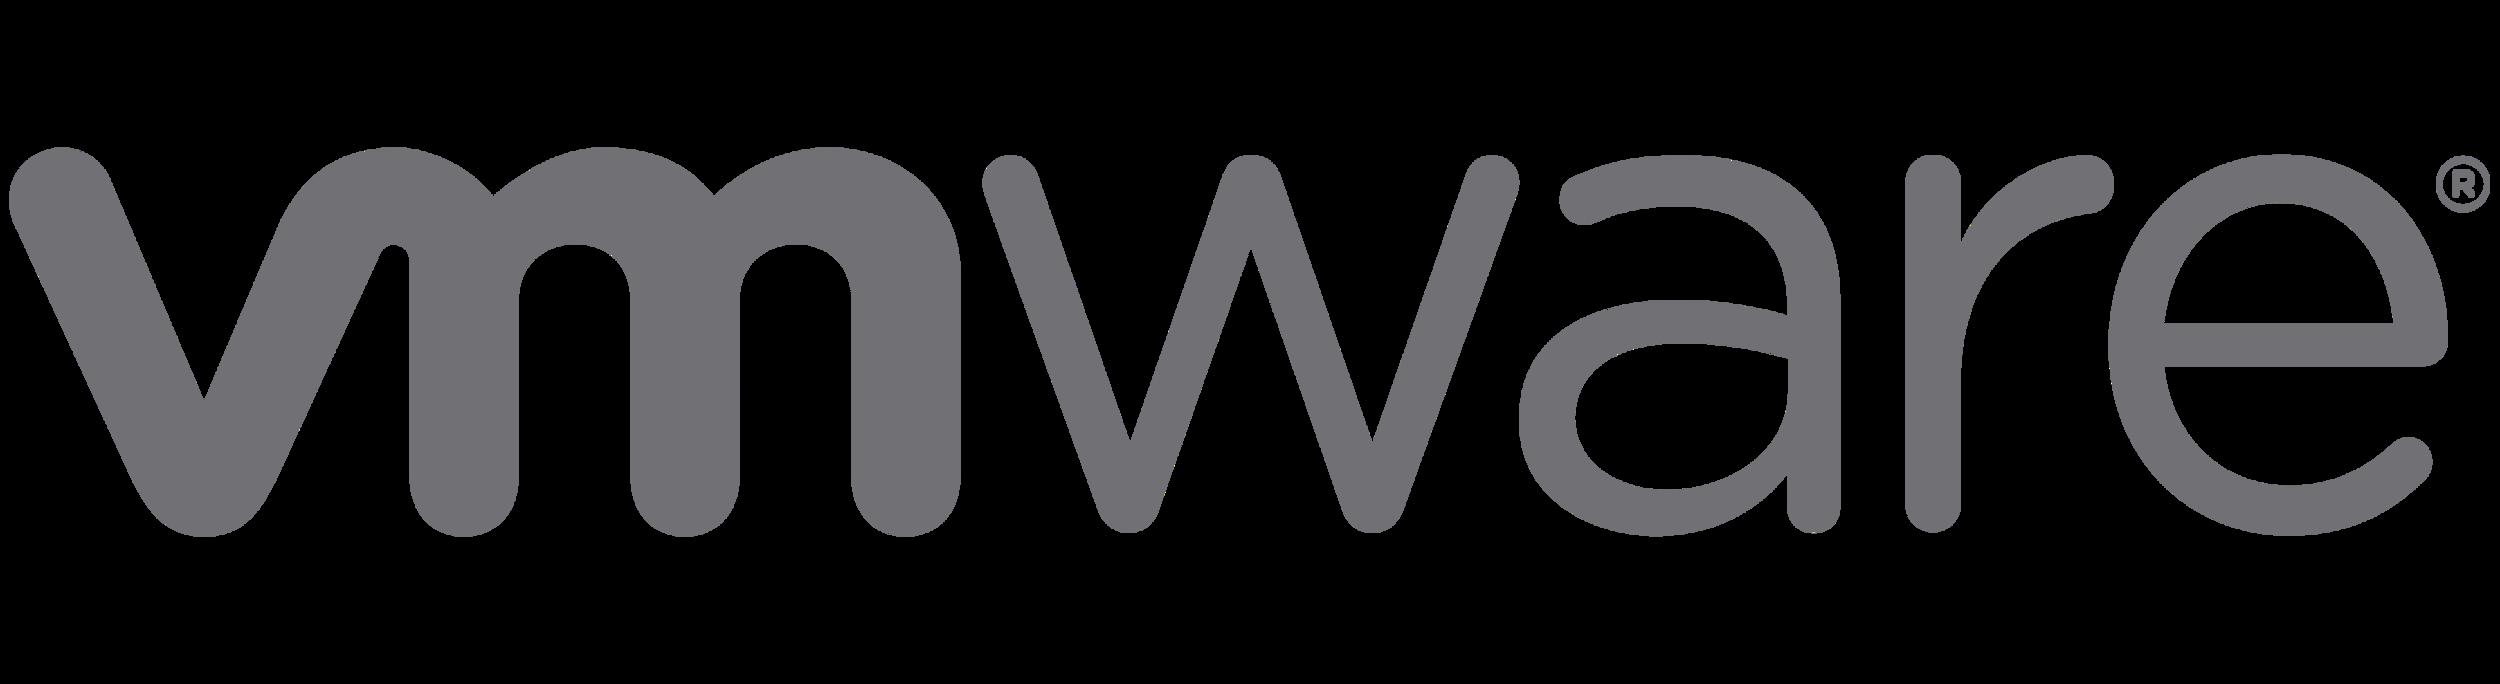 VMware copy.png